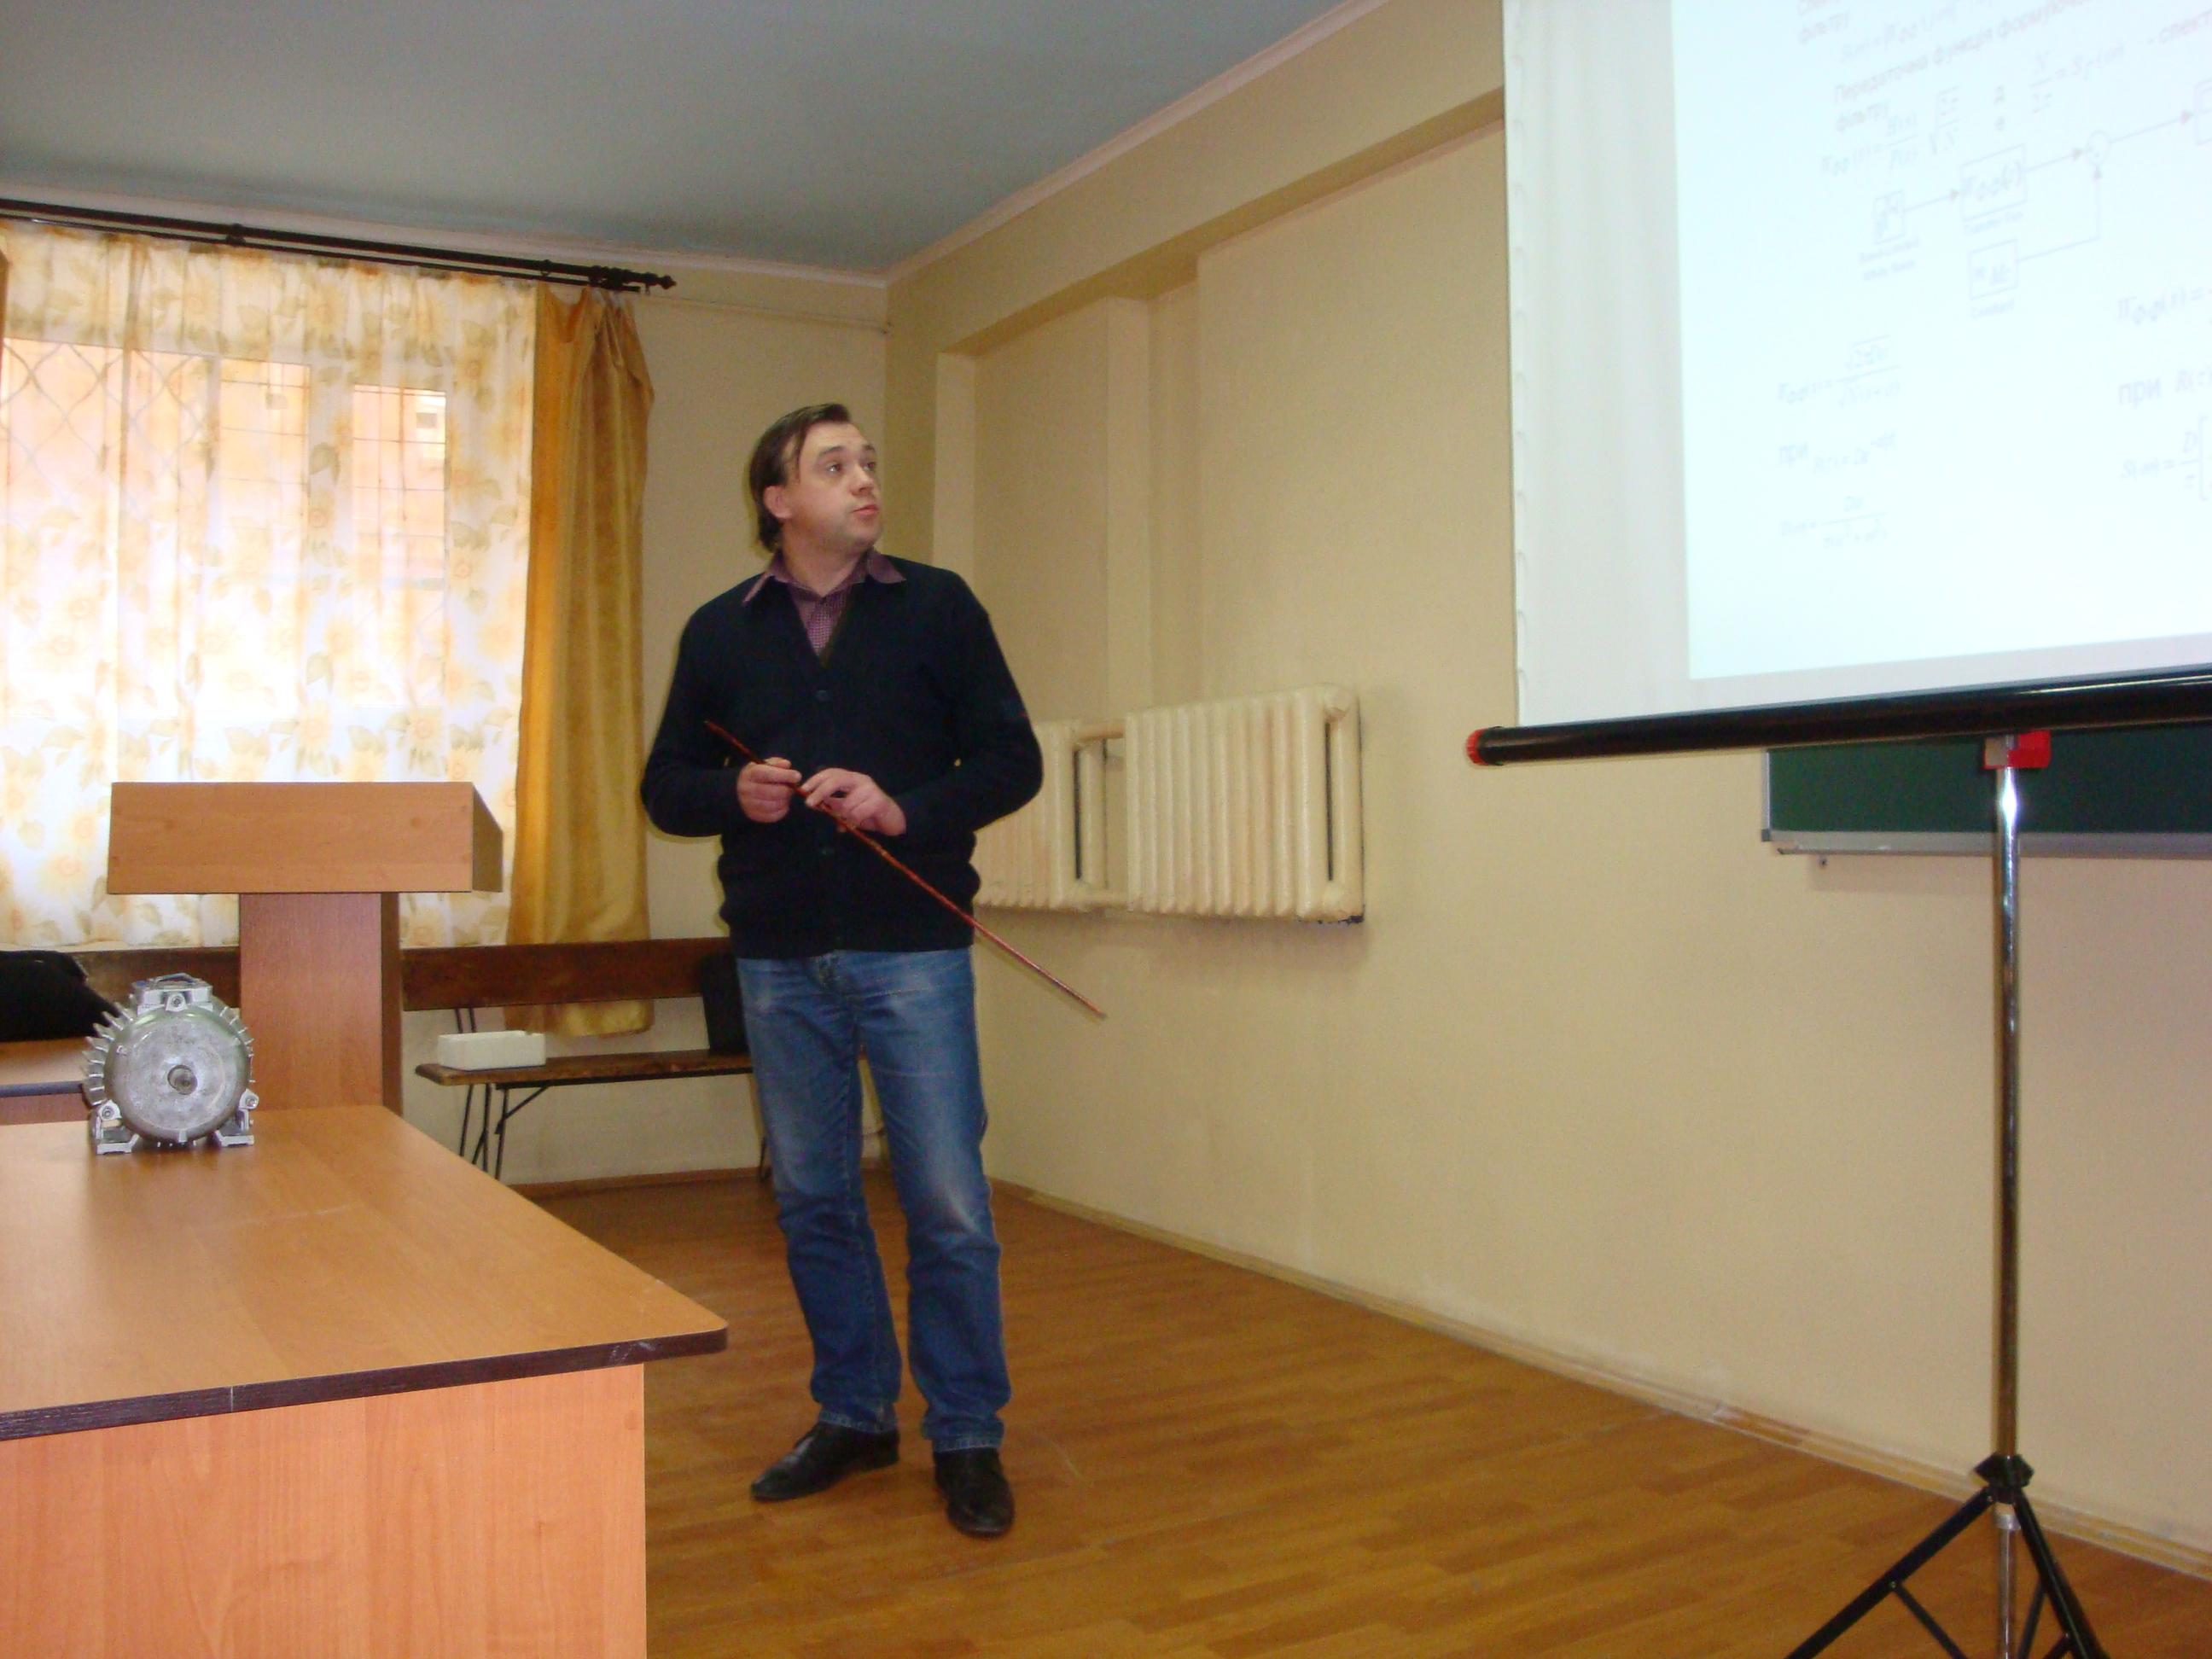 Ст. н. с. Шуруб Ю.В. (ИЭД НАНУ, Киев)